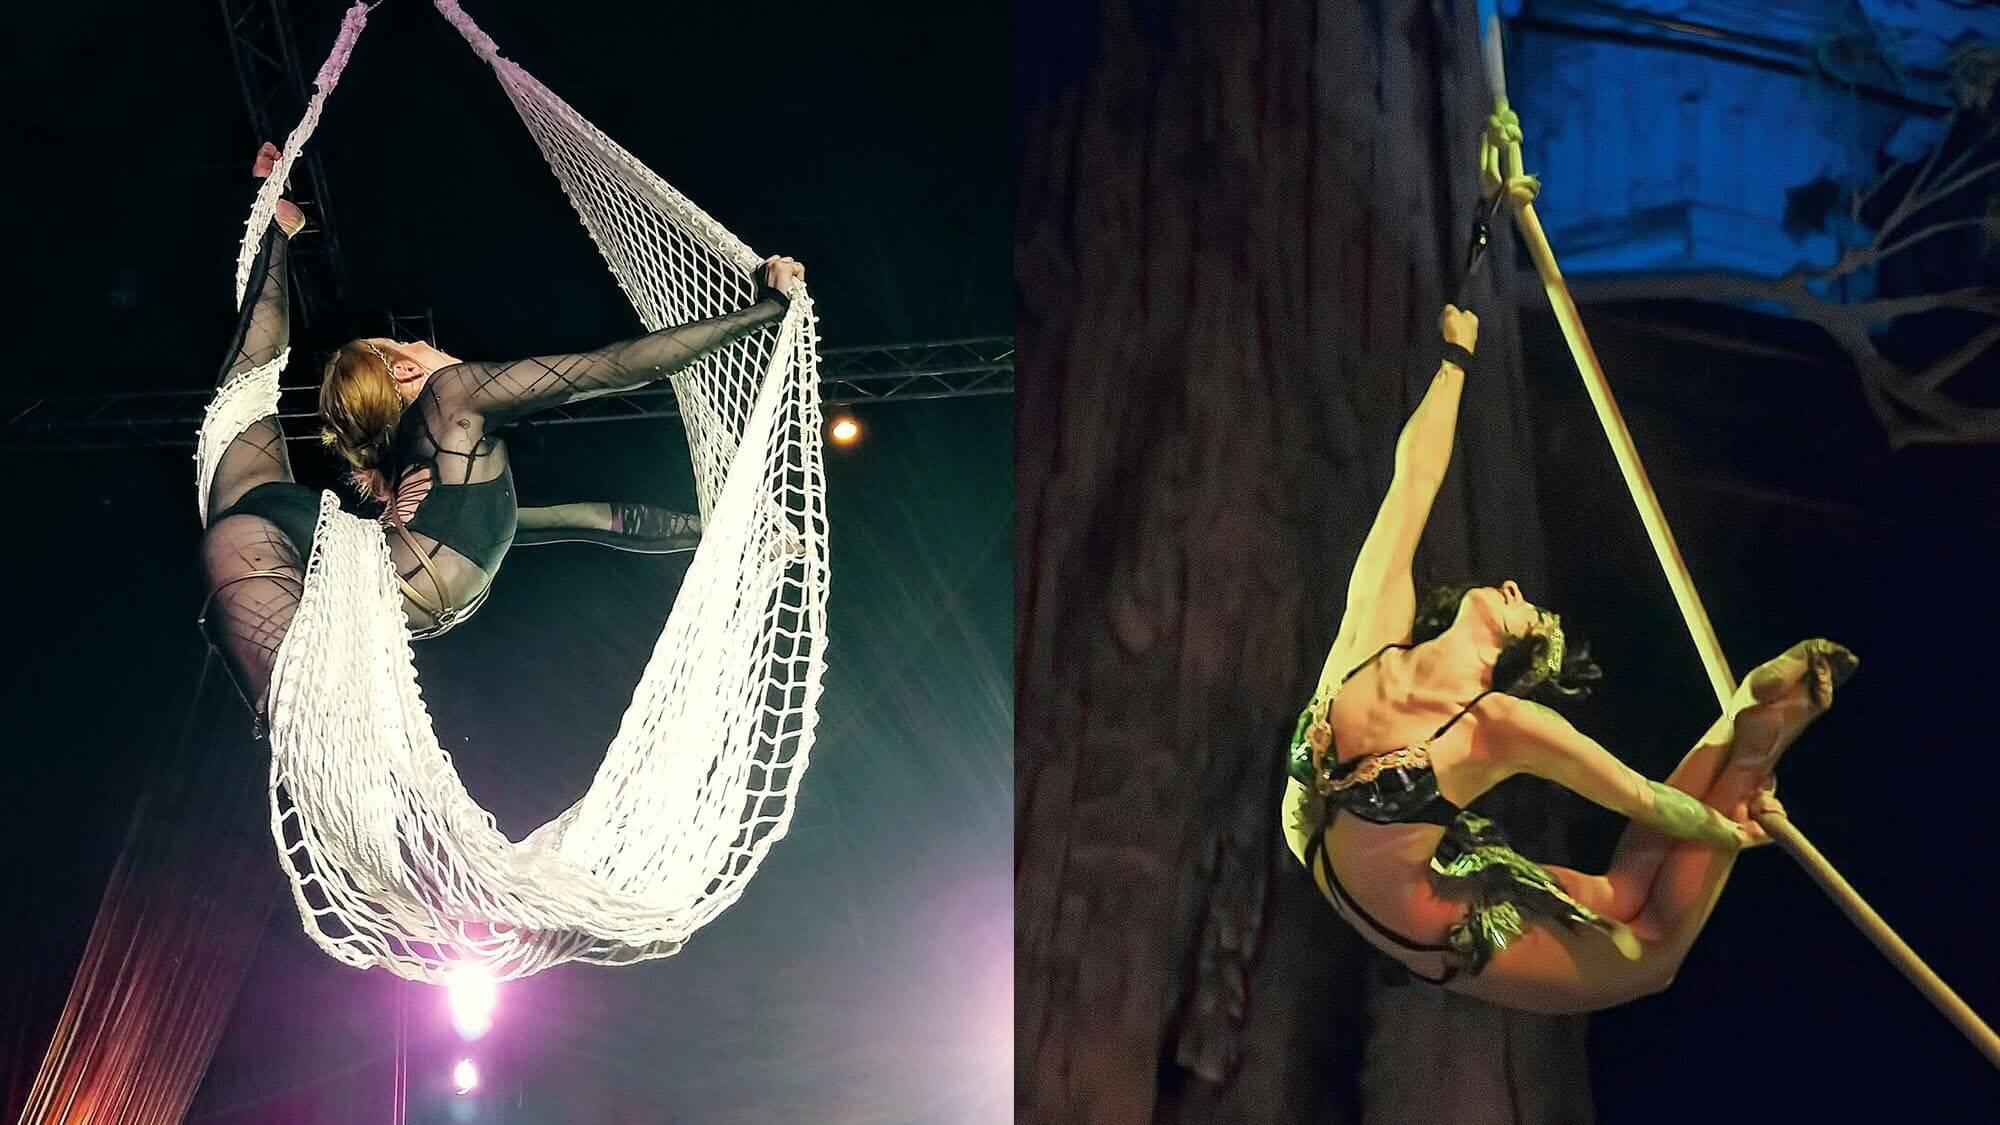 Aerial Net & Spanish Web performer, Tina Phoenix